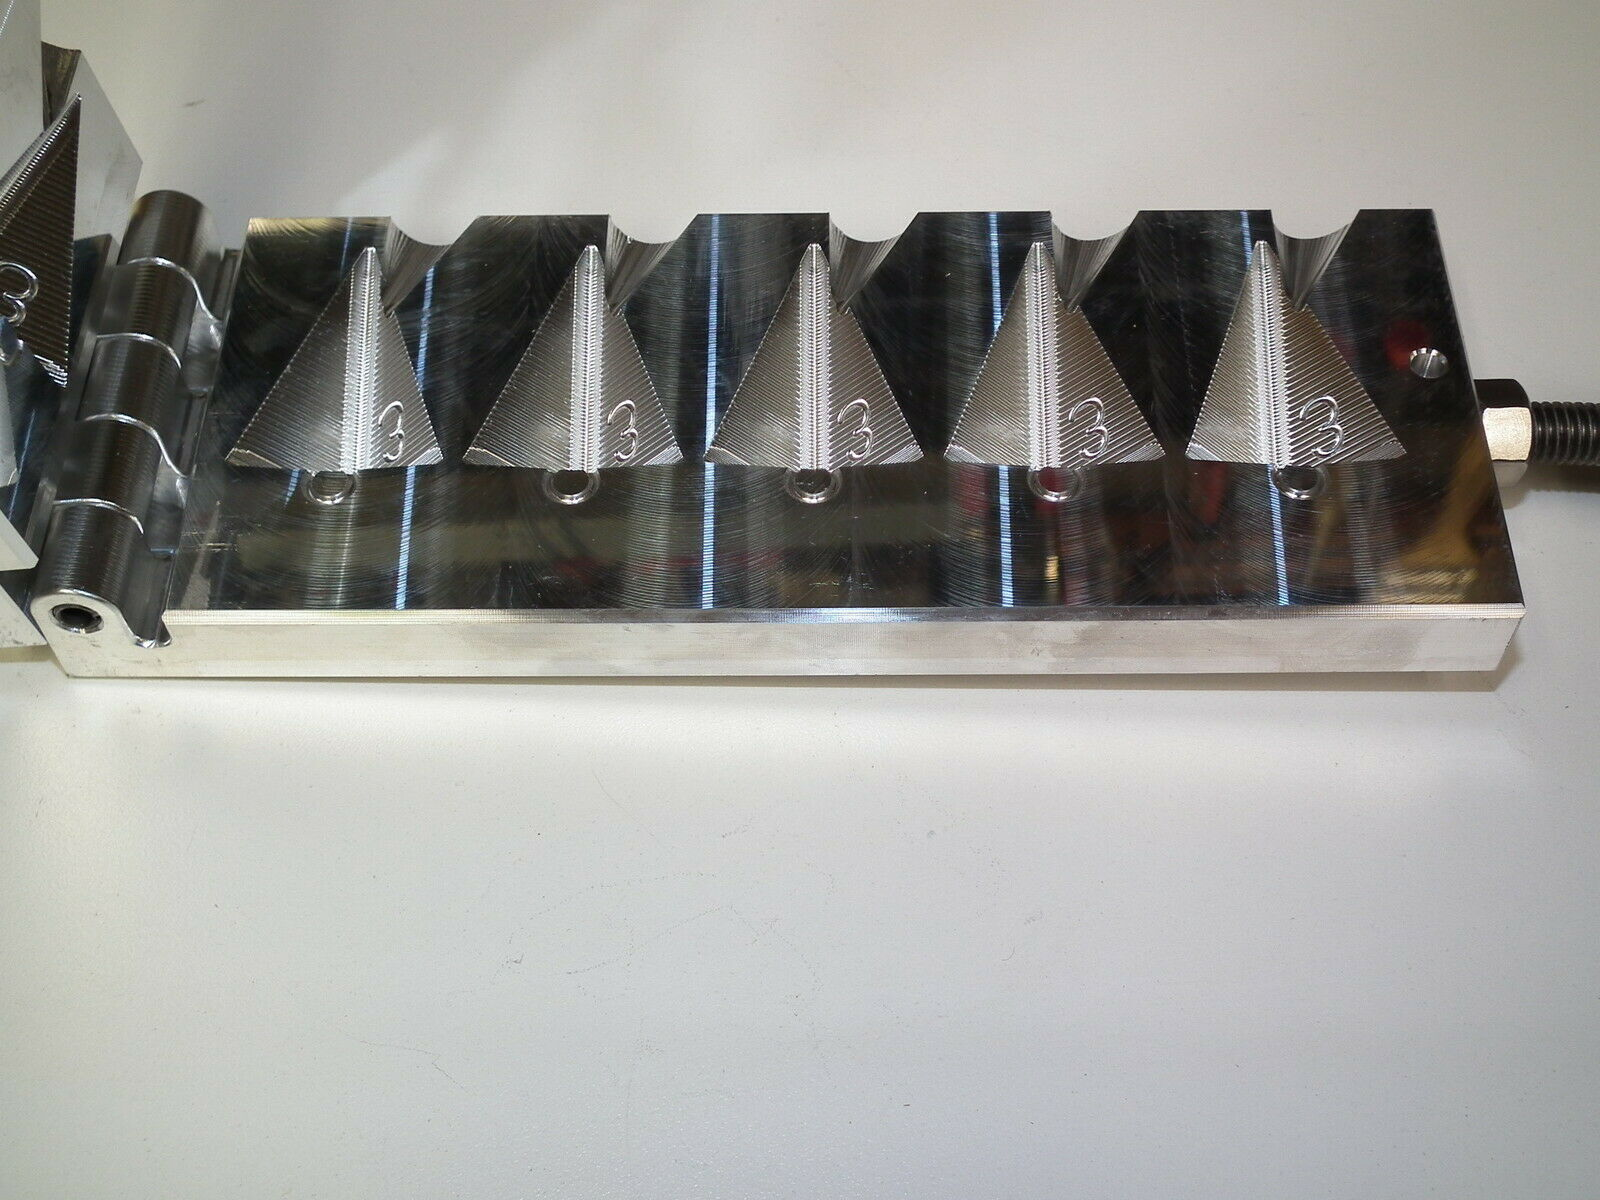 Pyramid Sinker Multi Cavity Production molds 1 to 10oz Choose Größe Surf